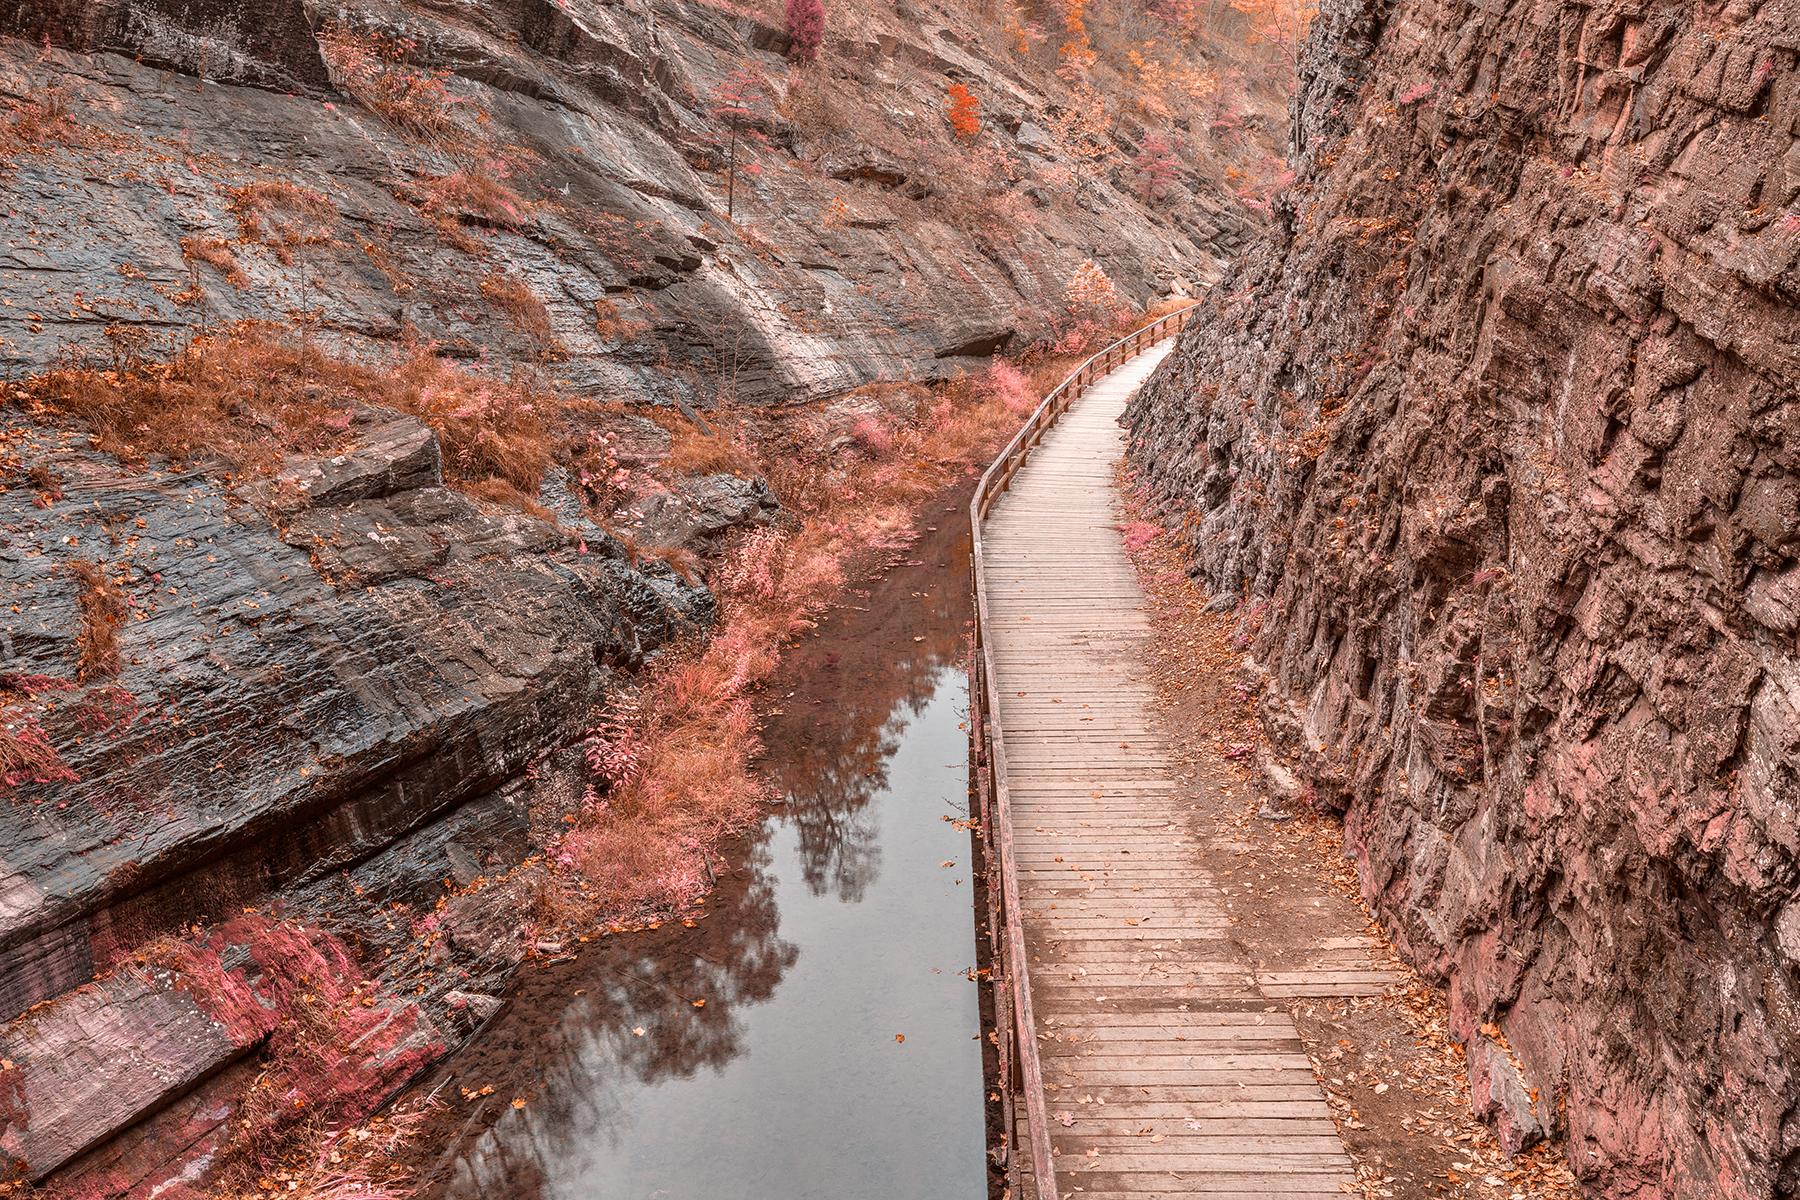 Paw paw boardwalk trail - pastel fantasy hdr photo